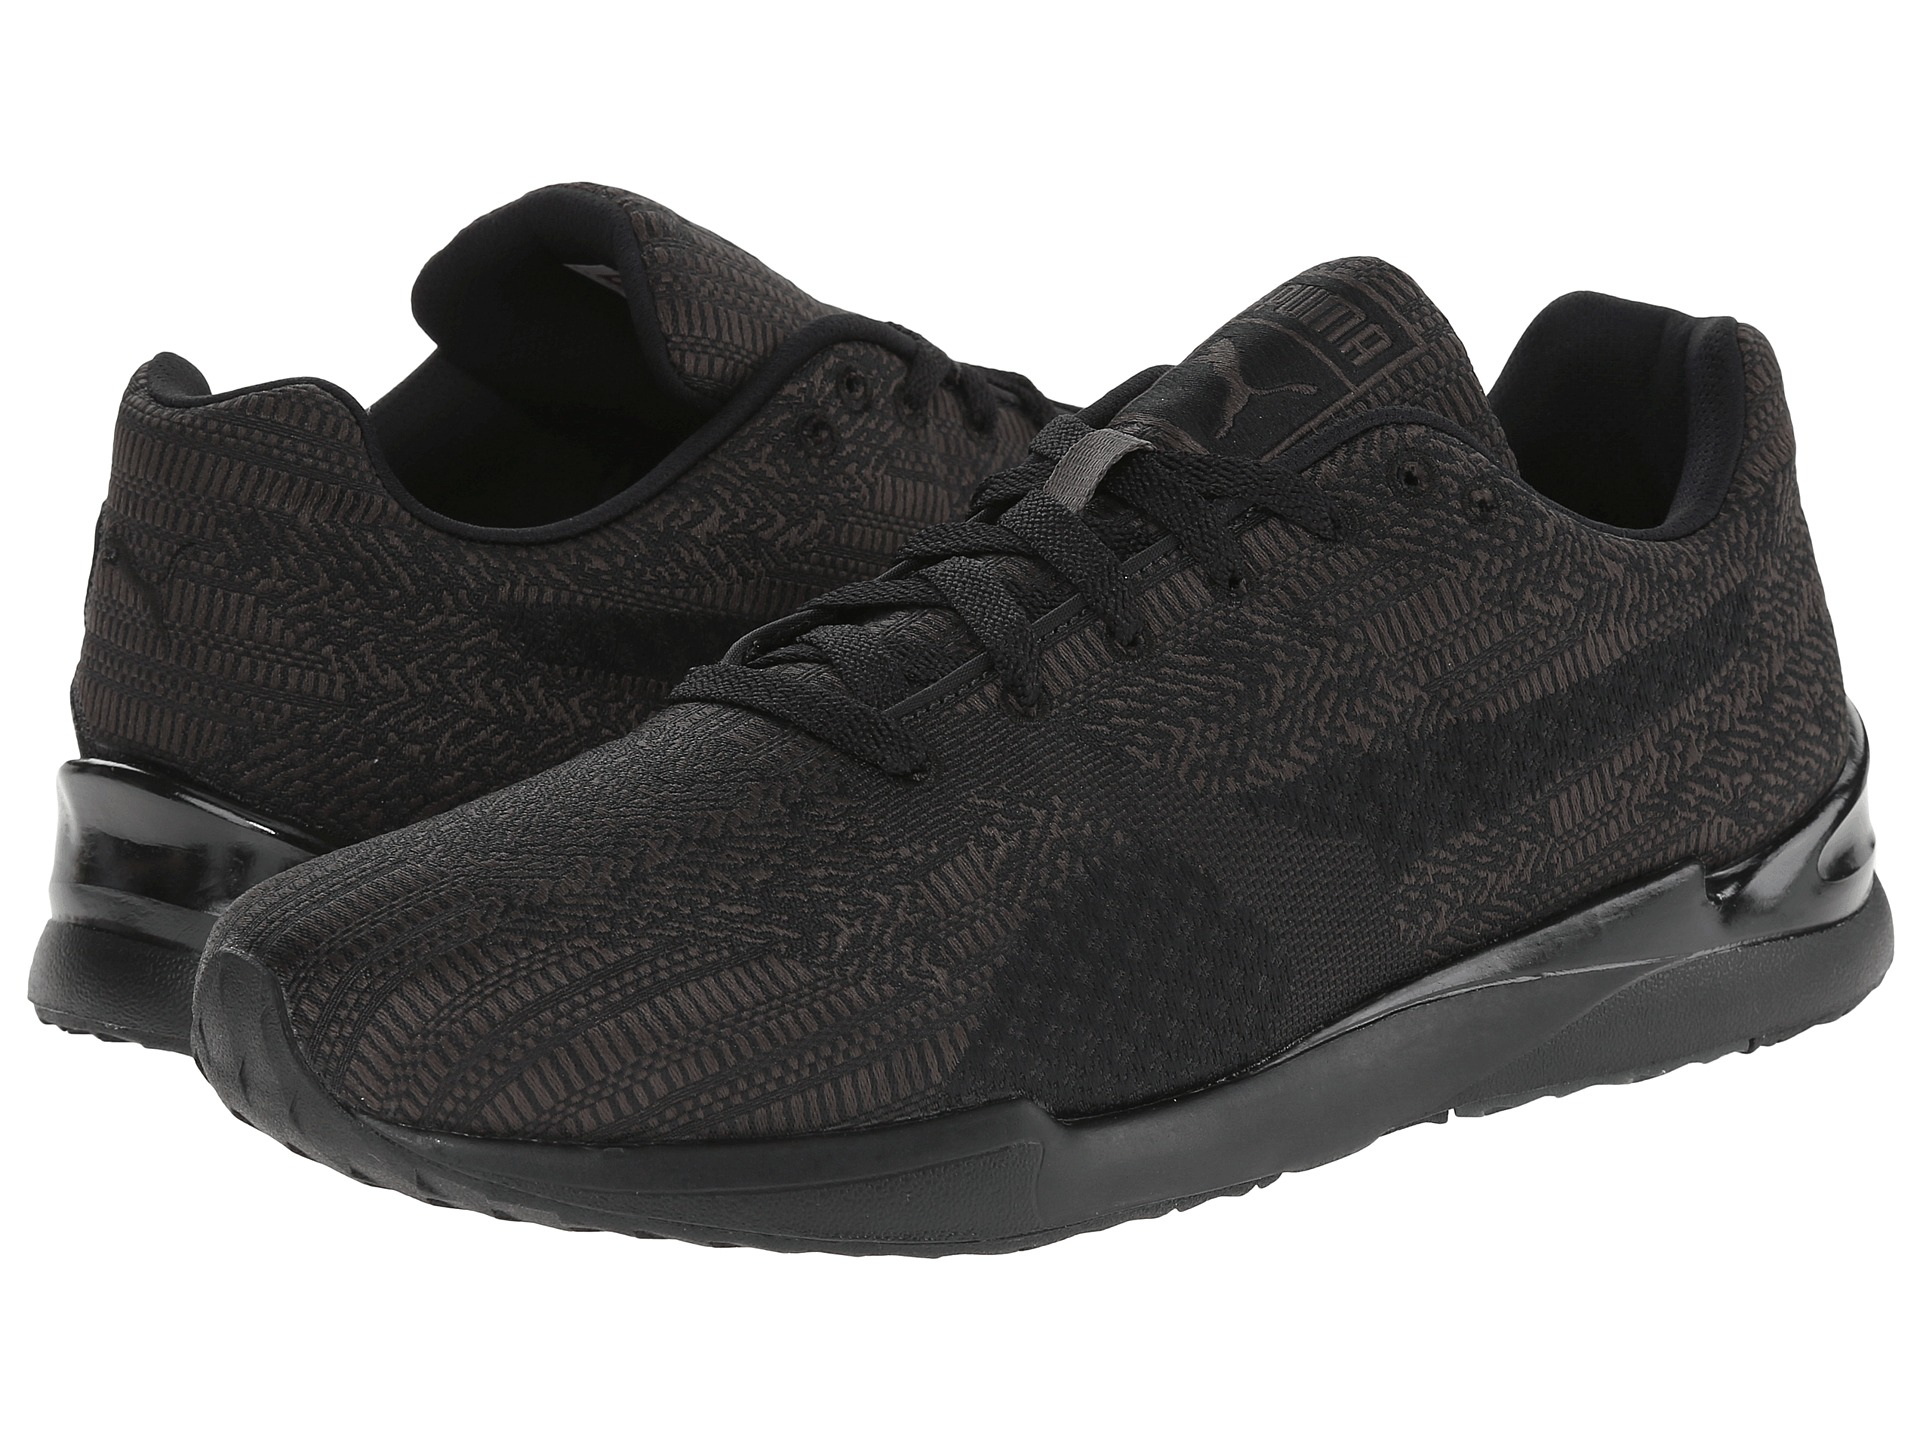 12030a60abf3 Lyst - PUMA Future Xs500 Swift Woven Mesh in Black for Men